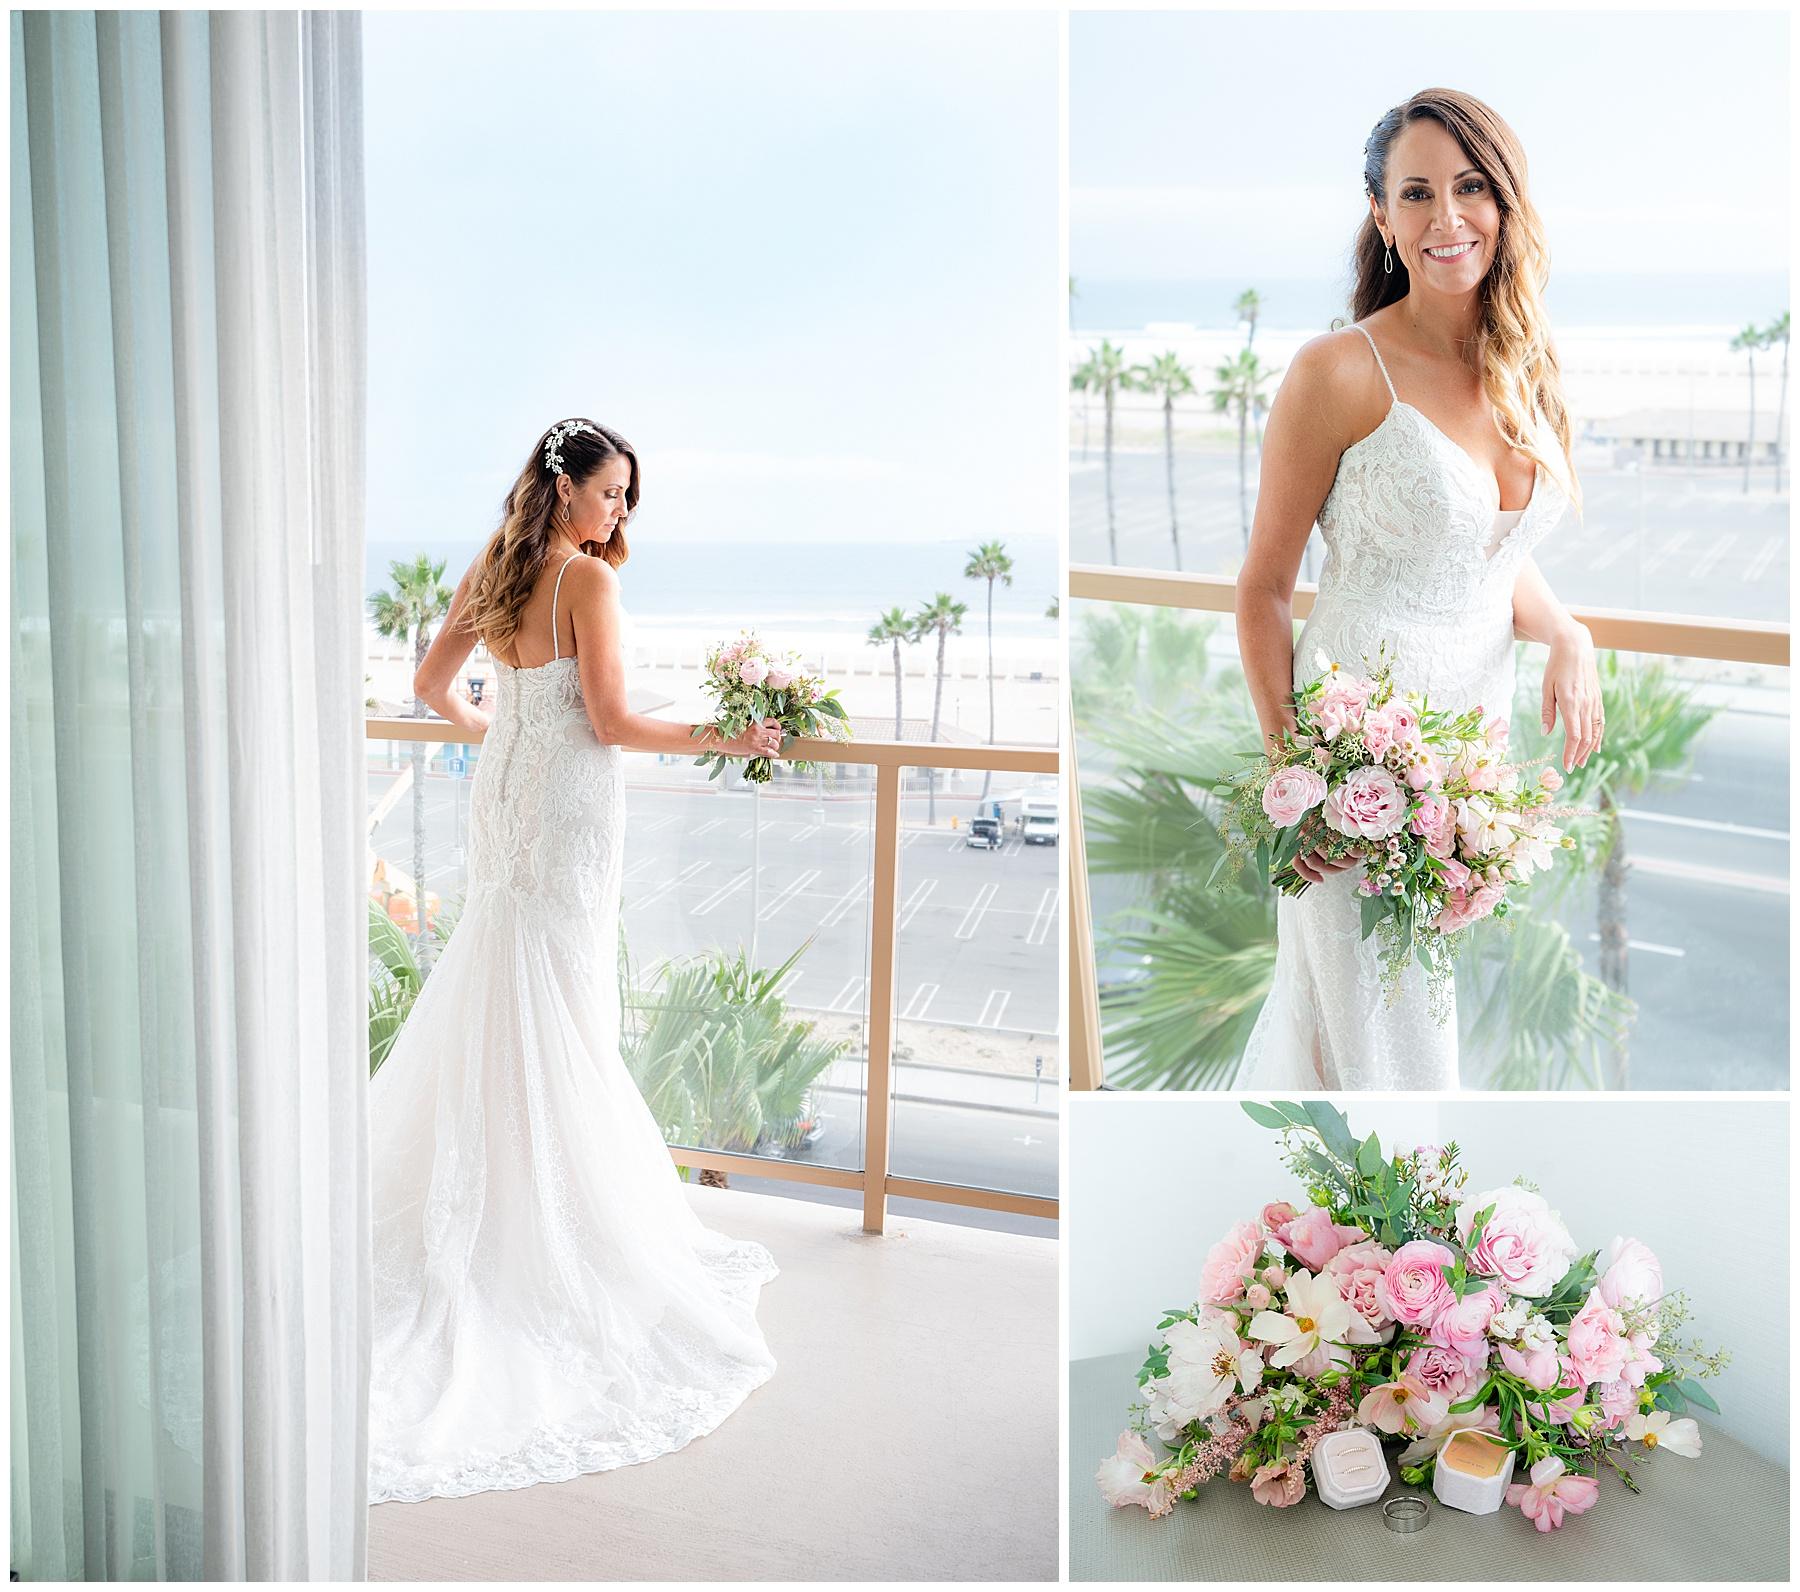 huntington beach wedding balcony portrait